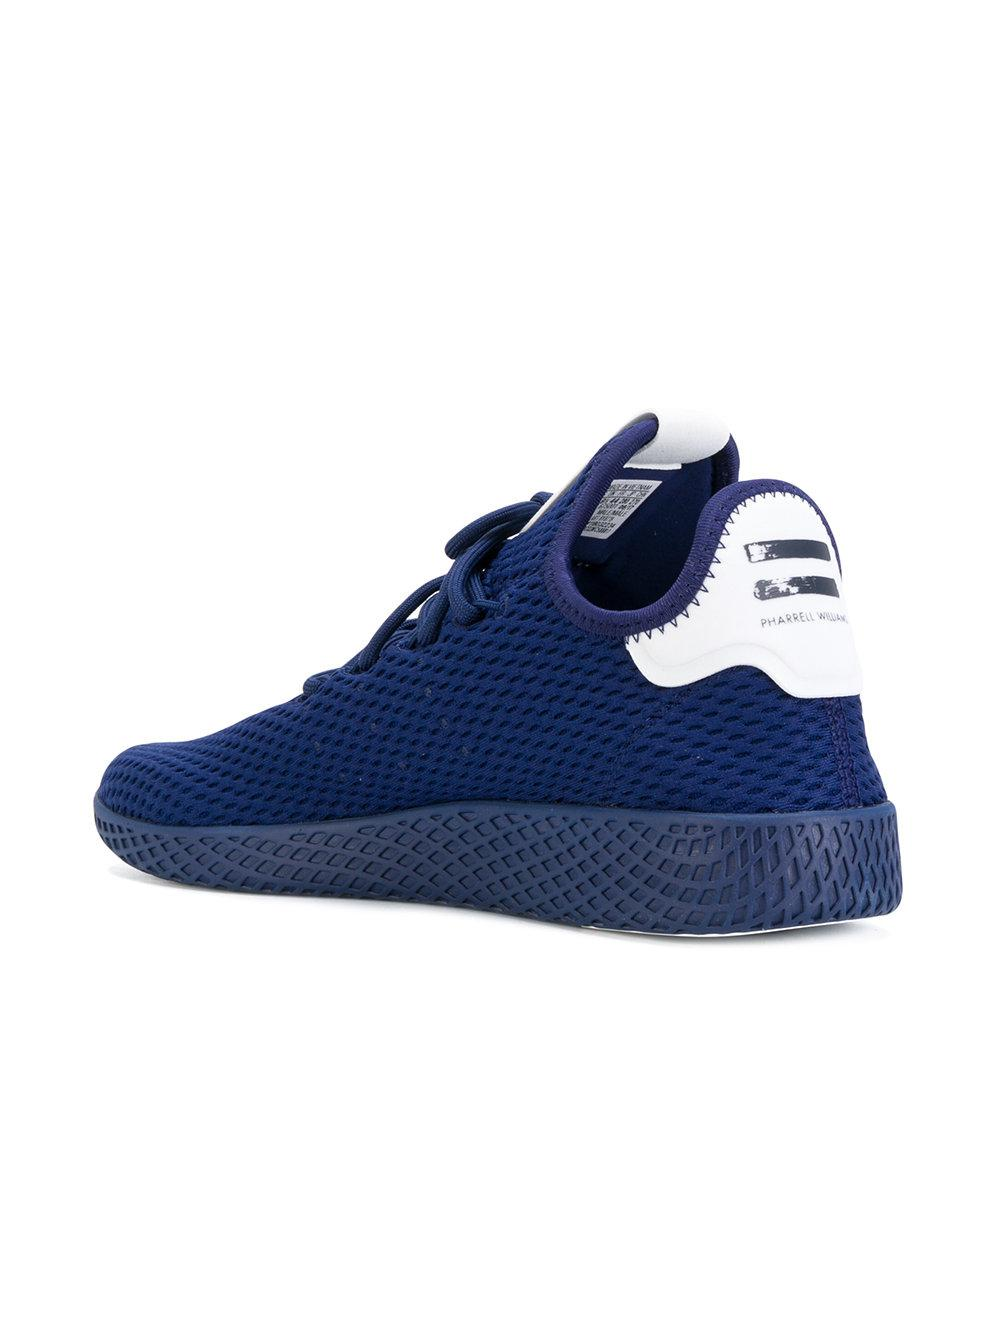 adidas Originals Leather Tennis Hu Sneakers in Blue